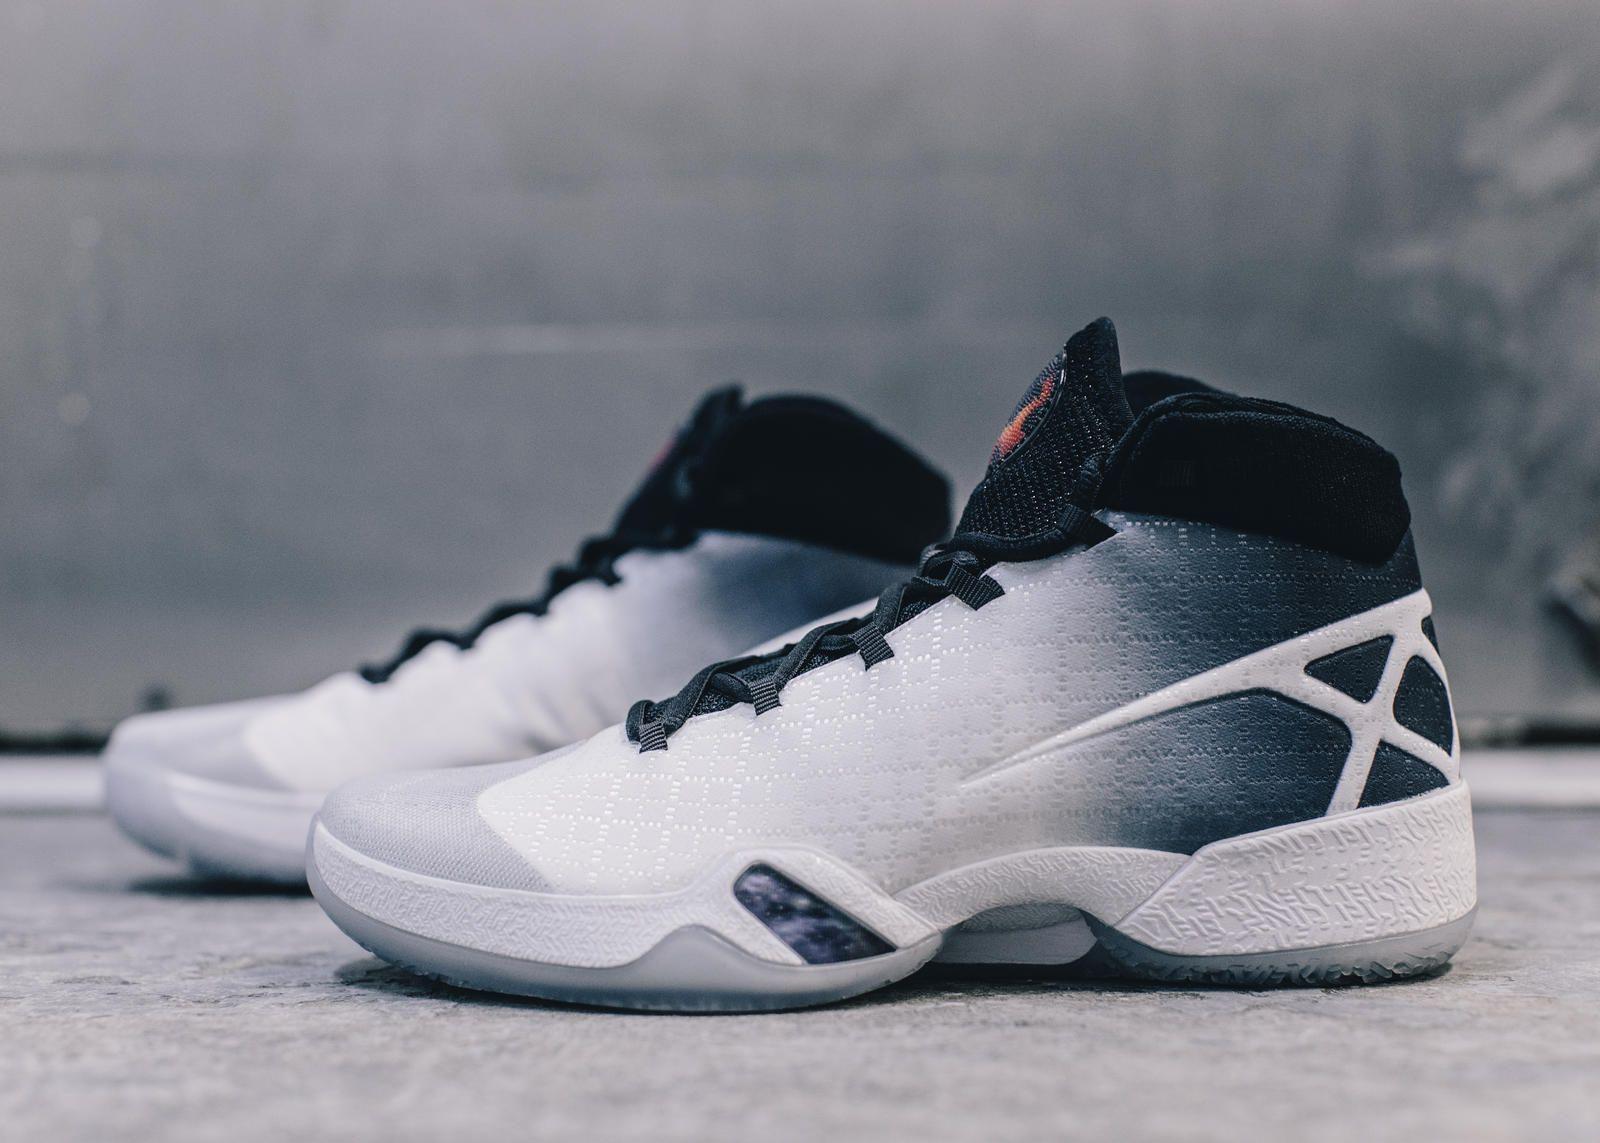 fb5646f97df6 Nike News - Jordan Brand Introduces the Air Jordan XXX  The Next Frontier  of Flight